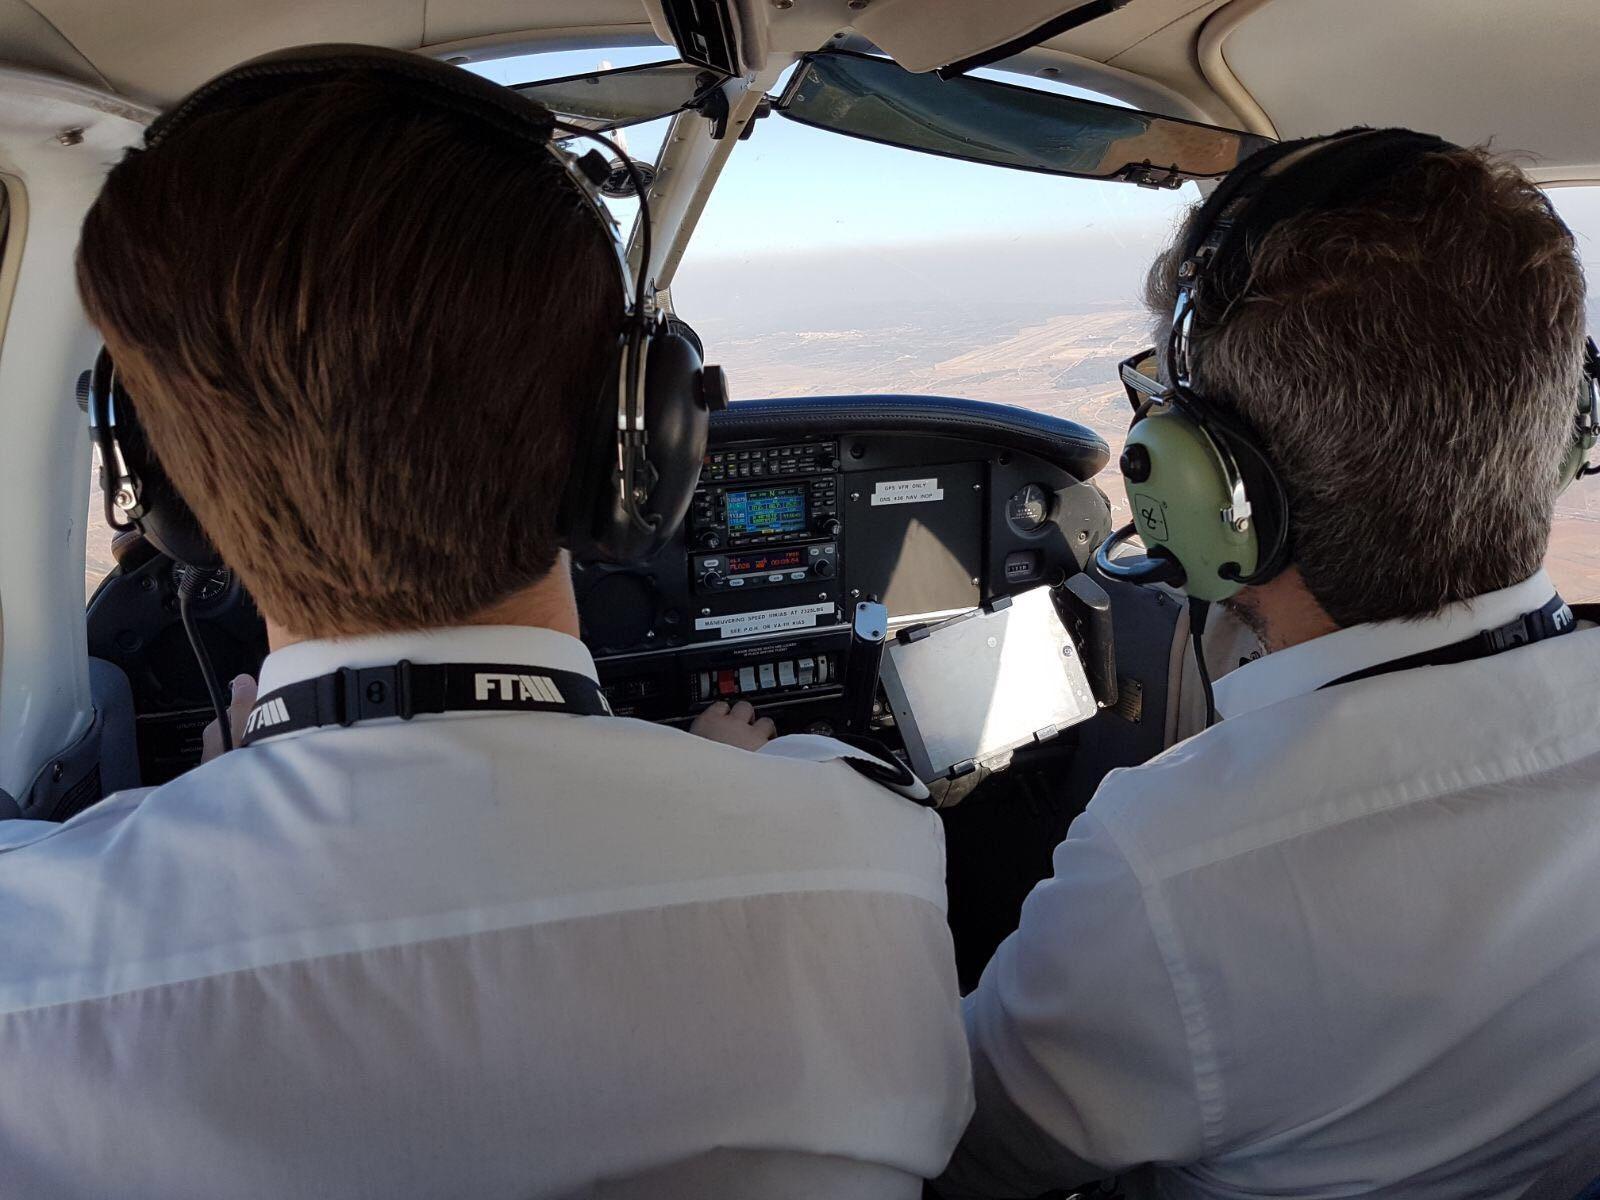 fta-teruel-spain-cockpit.jpg